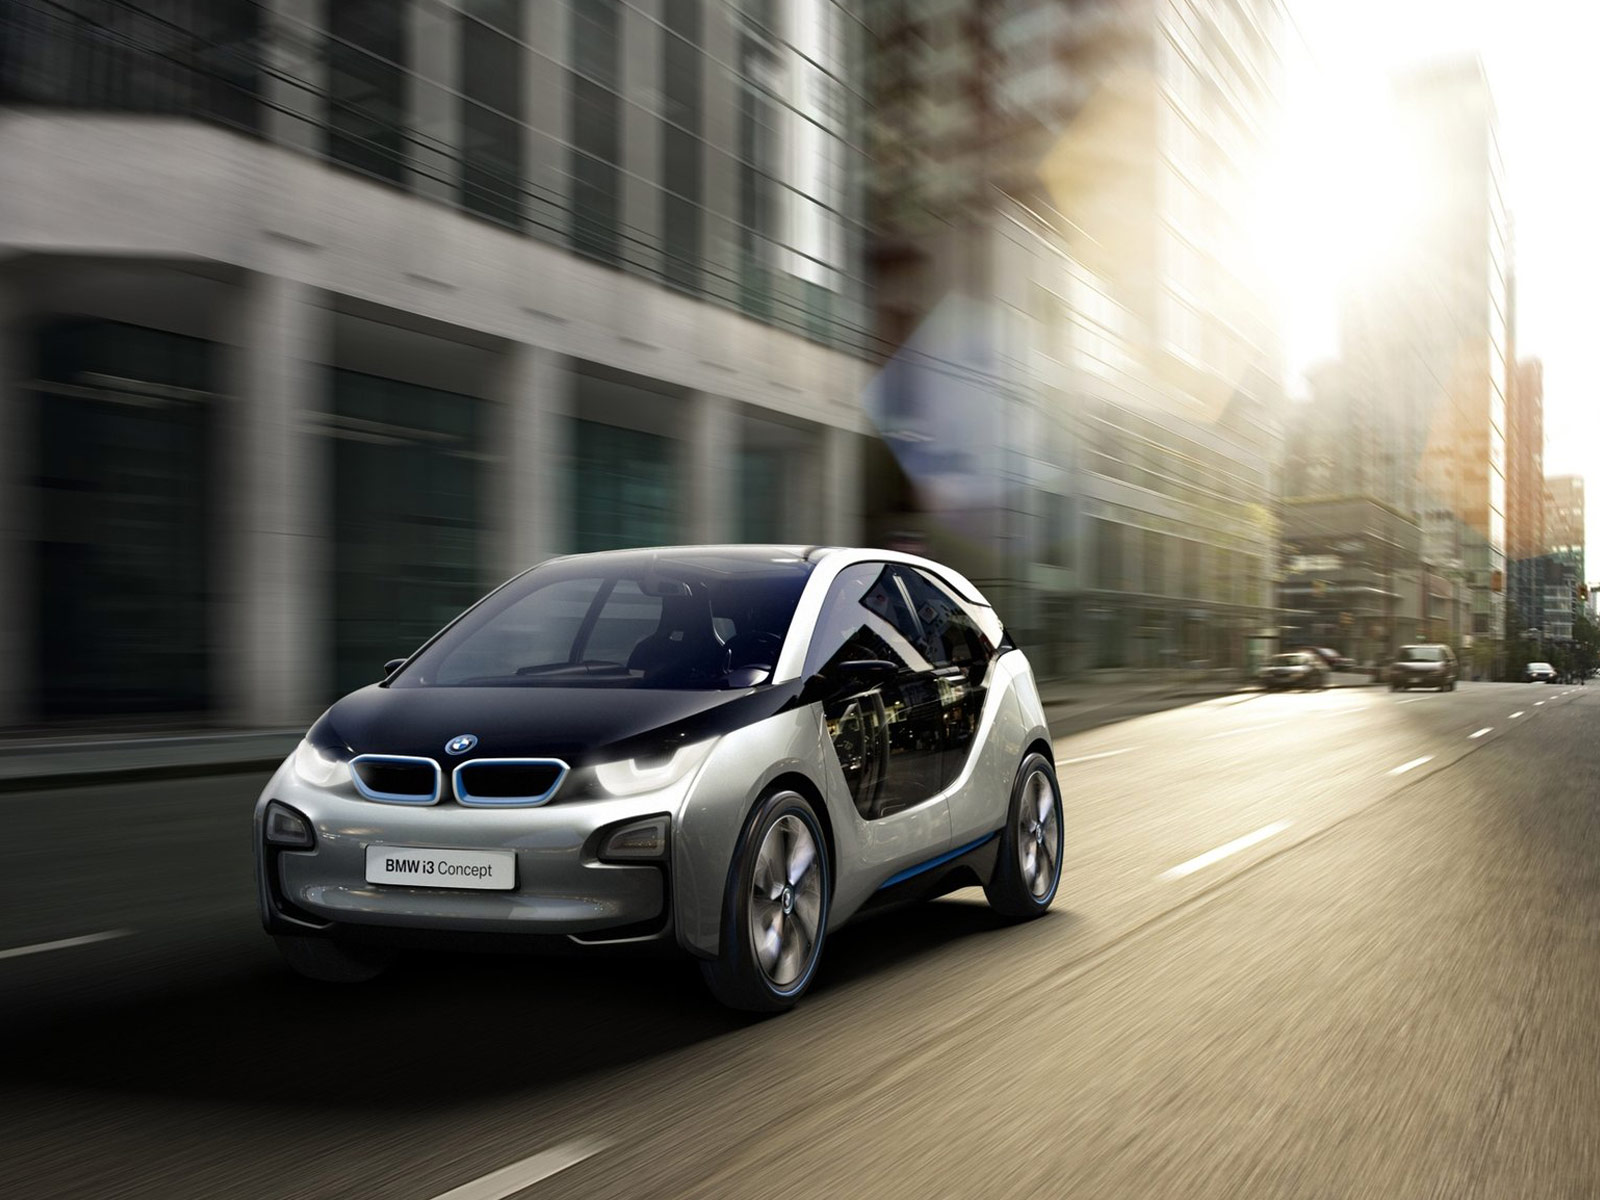 2011 BMW i3 Concept Car Insurance Information